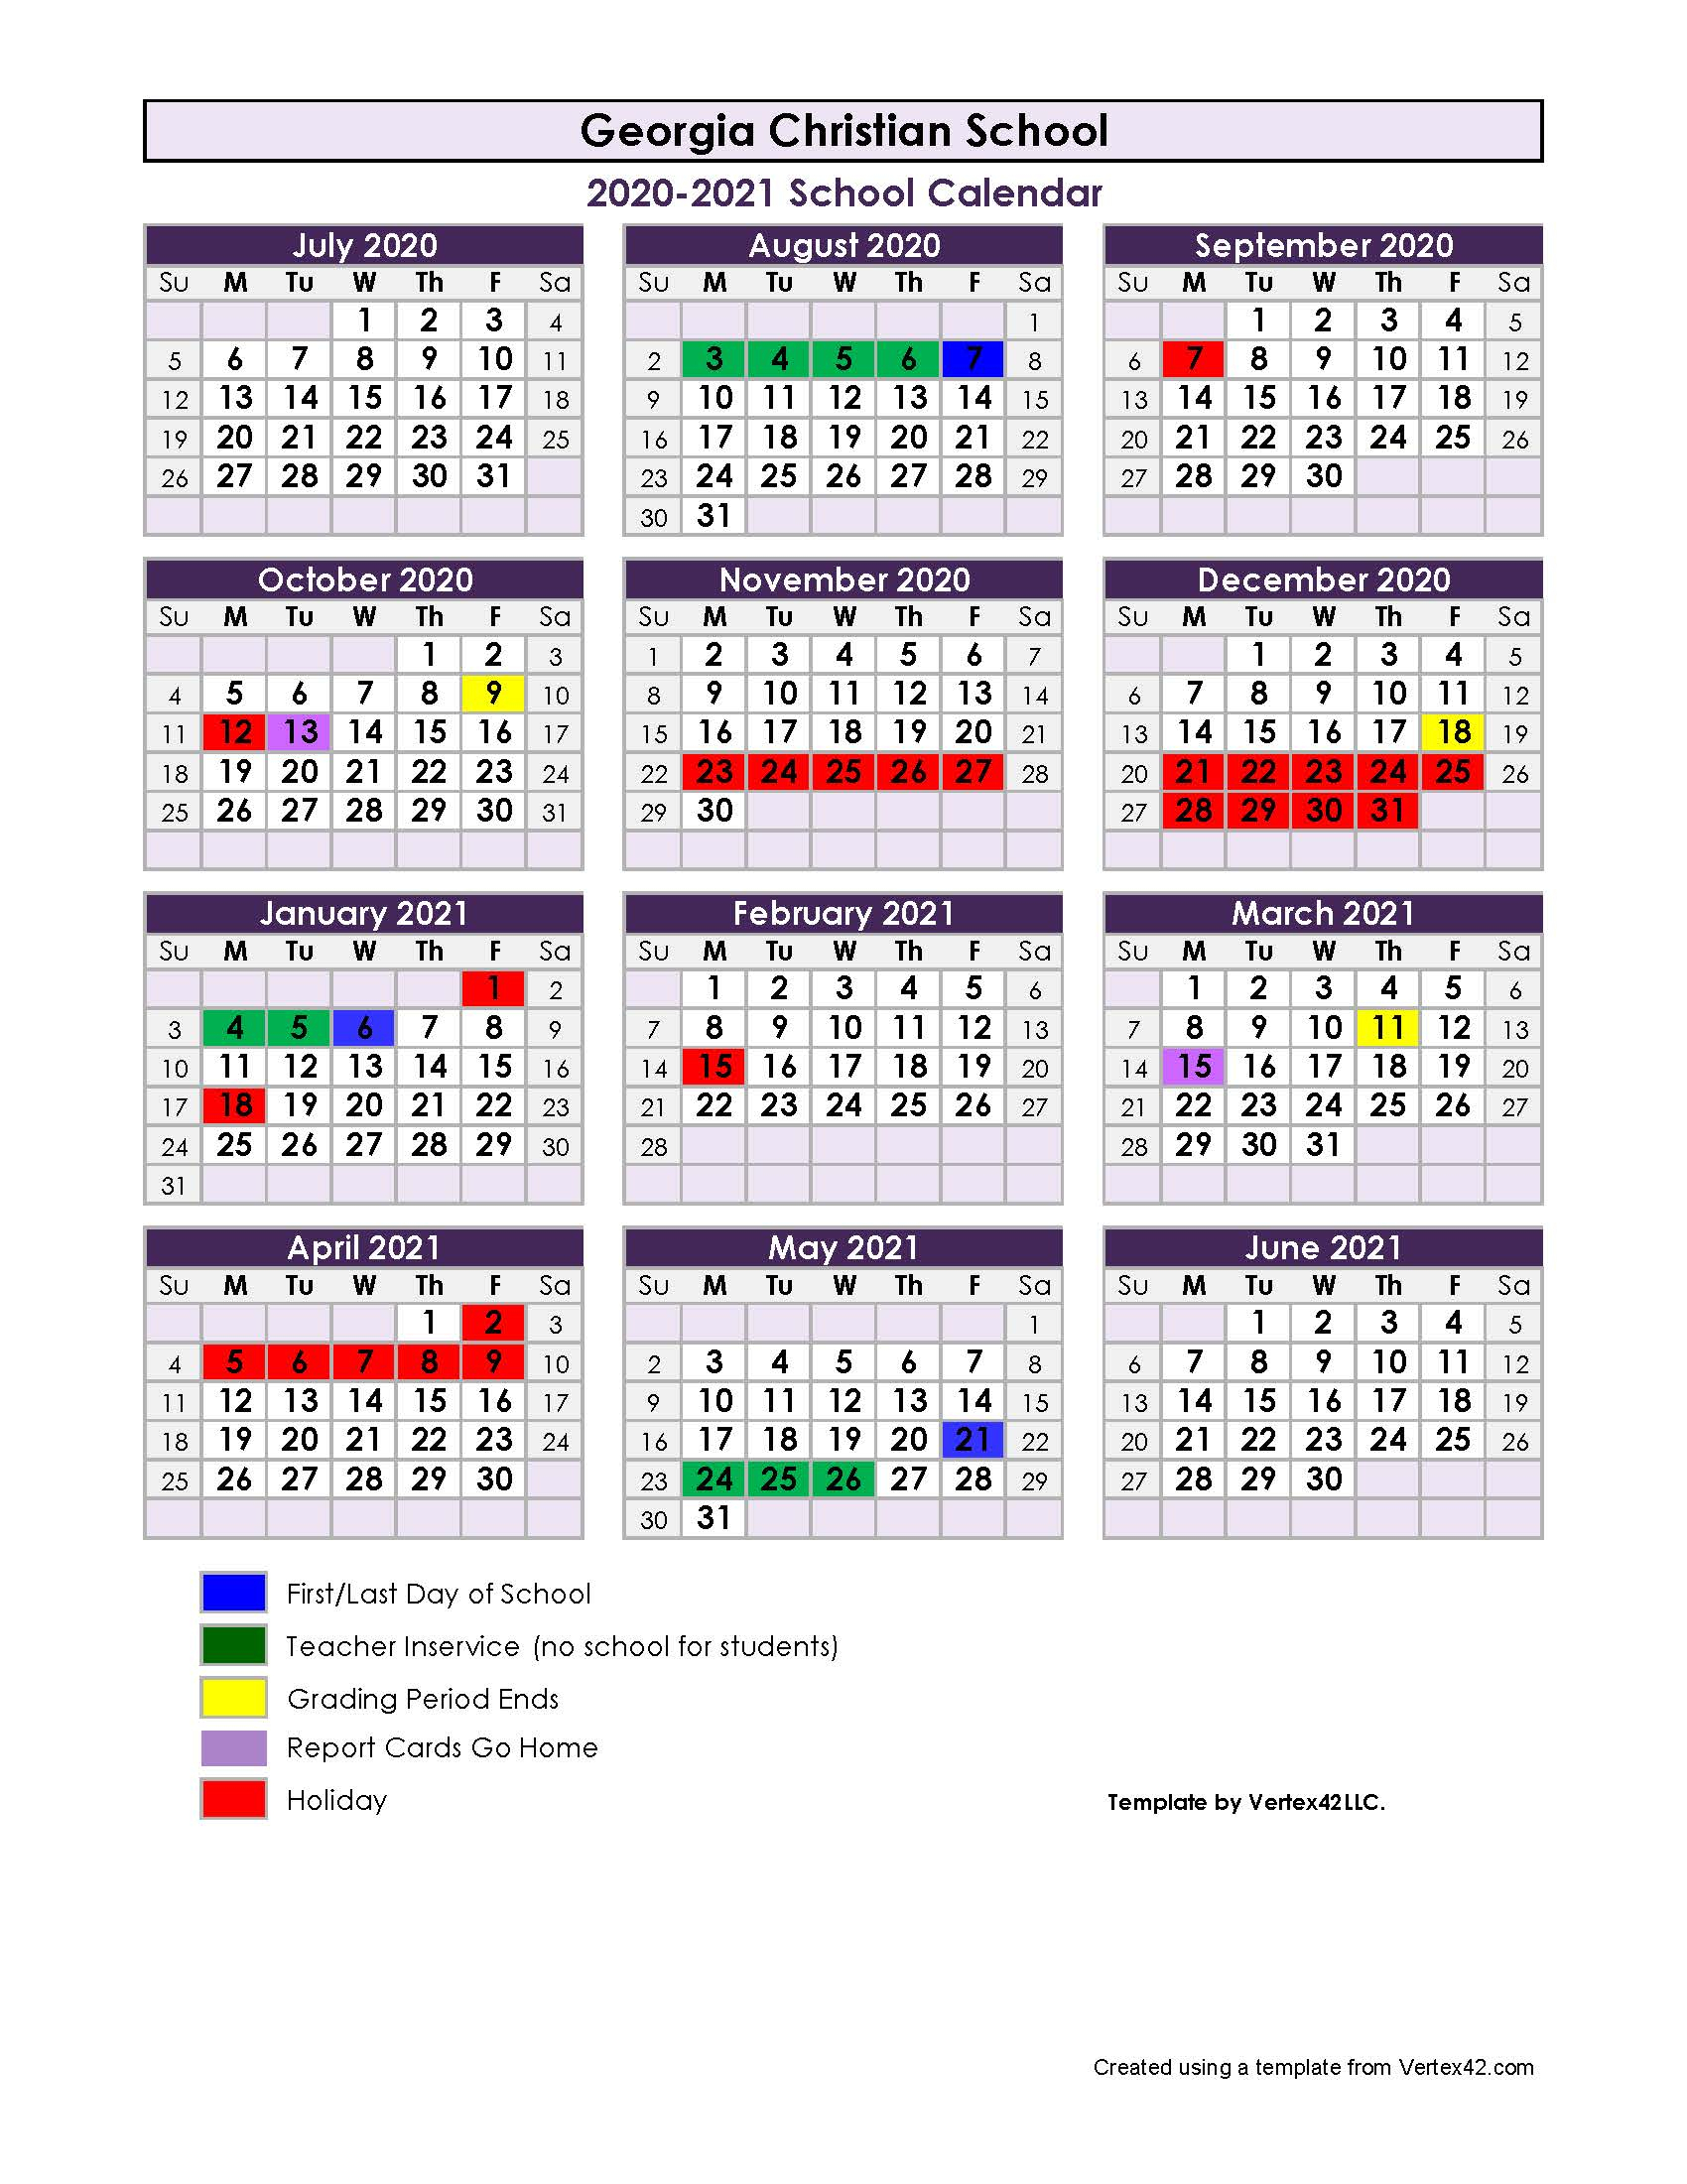 2020-2021 School Calendar - Georgia Christian School intended for Vertex Academic Calendar